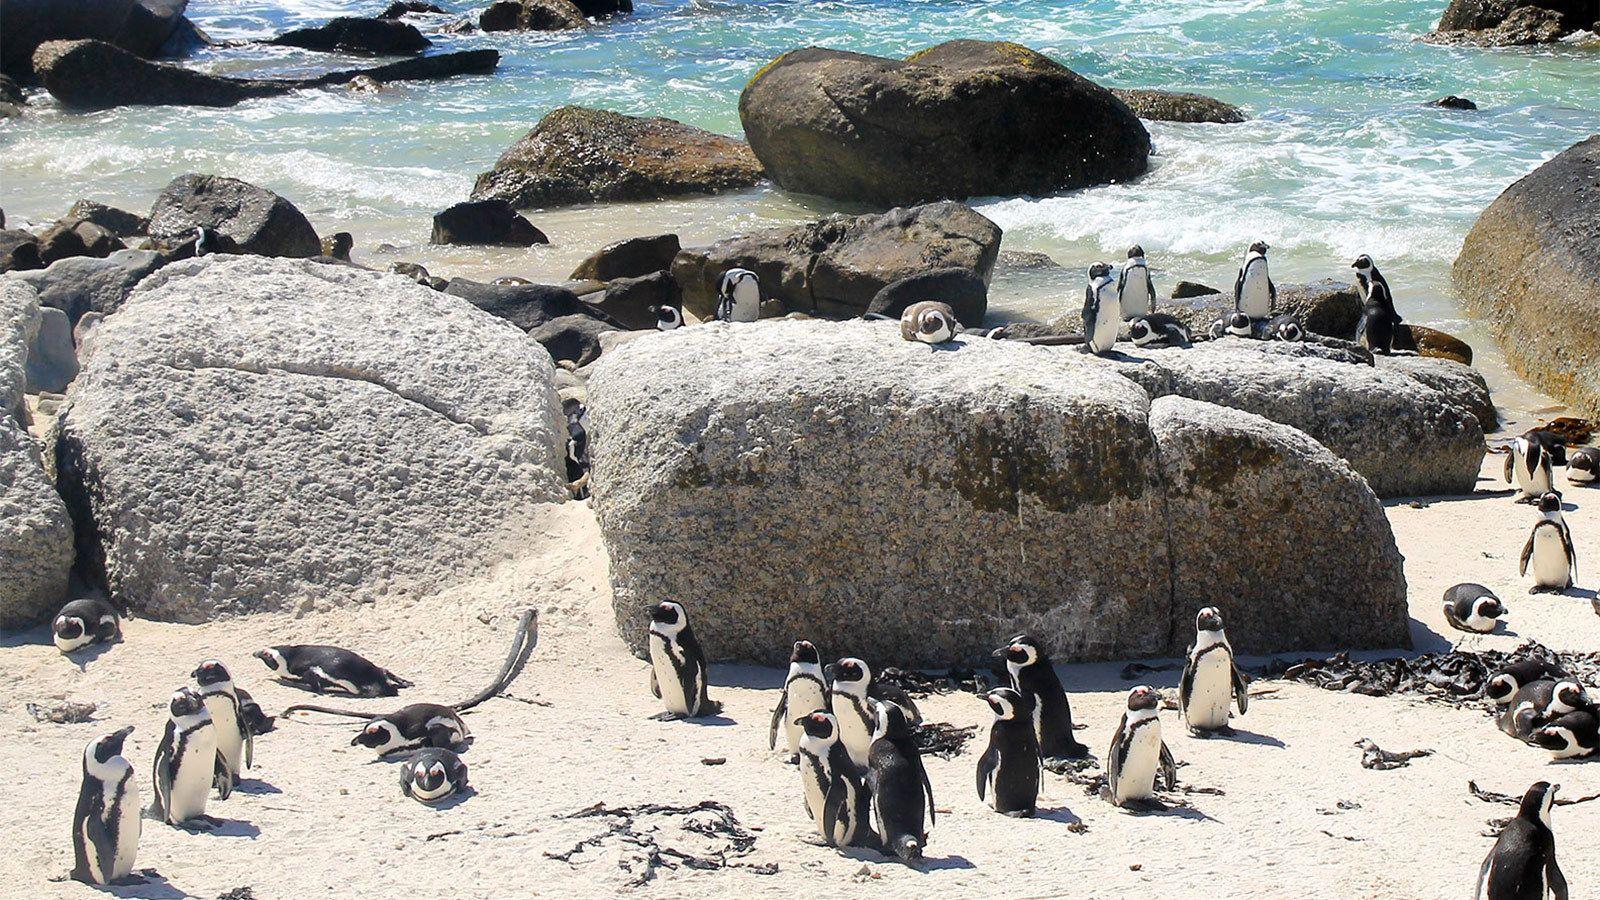 Cute penguins at Cape Peninsula in South Africa